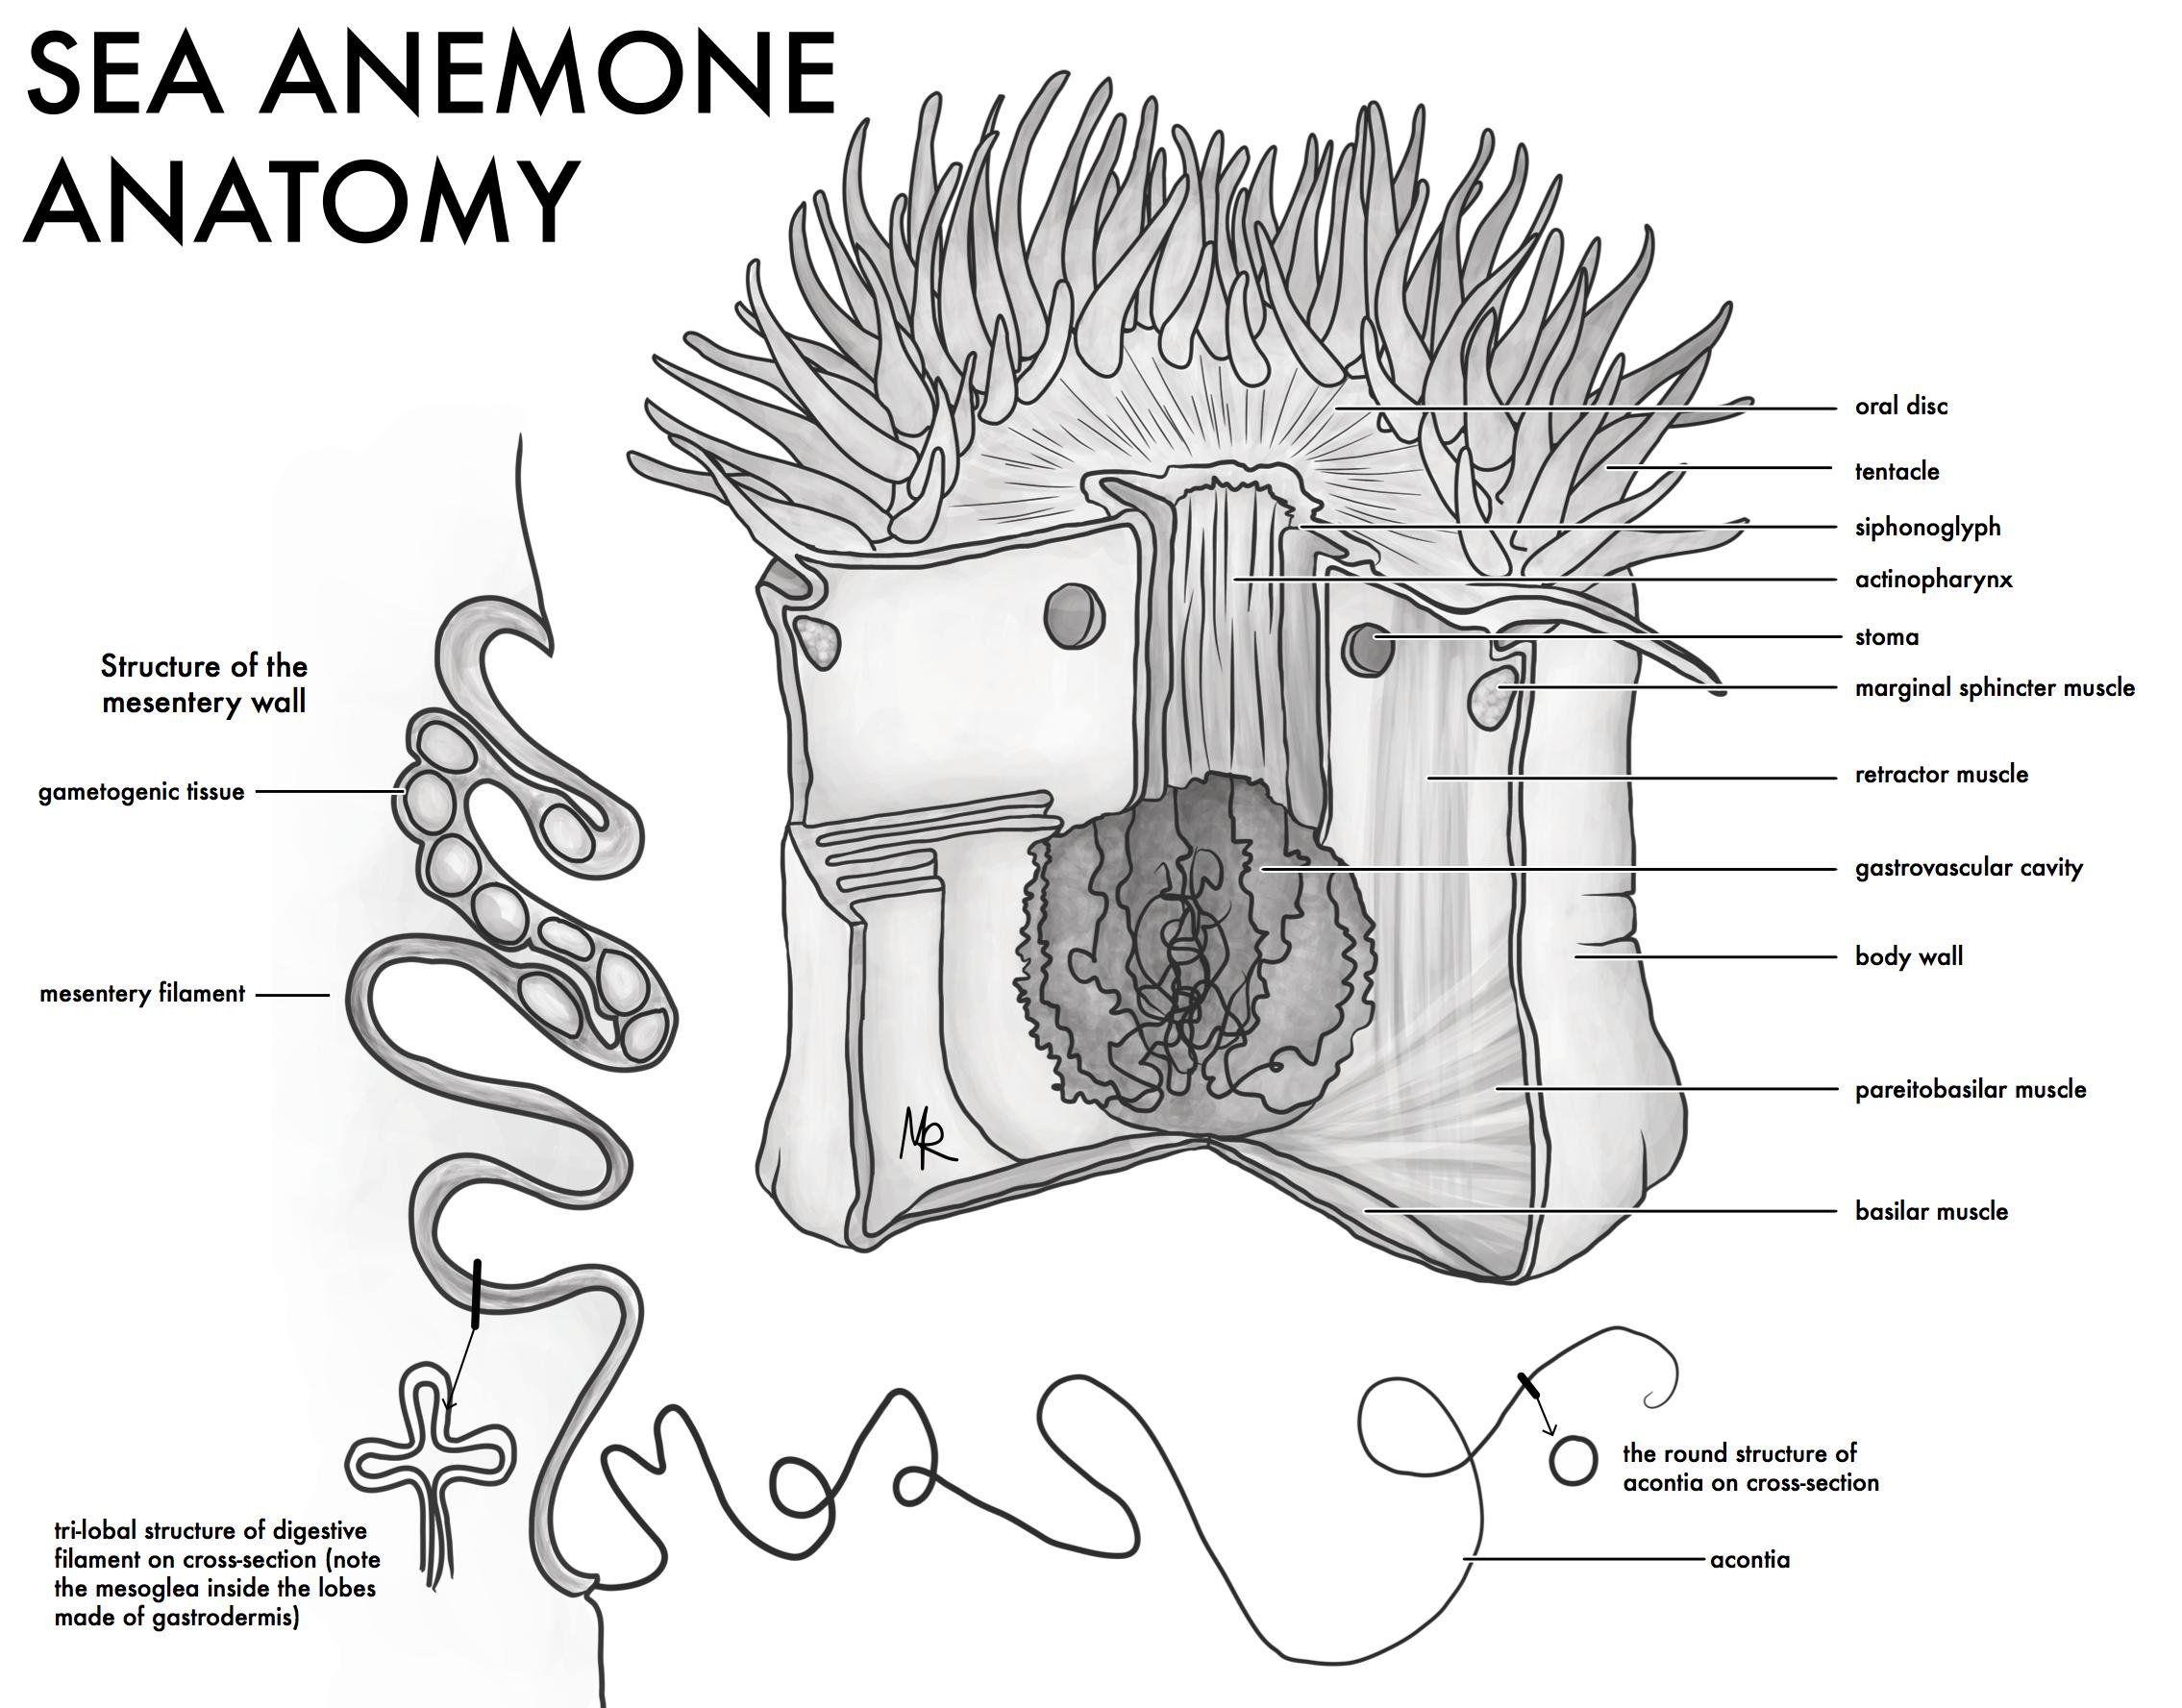 Sea Anemone Anatomy Cut-Away